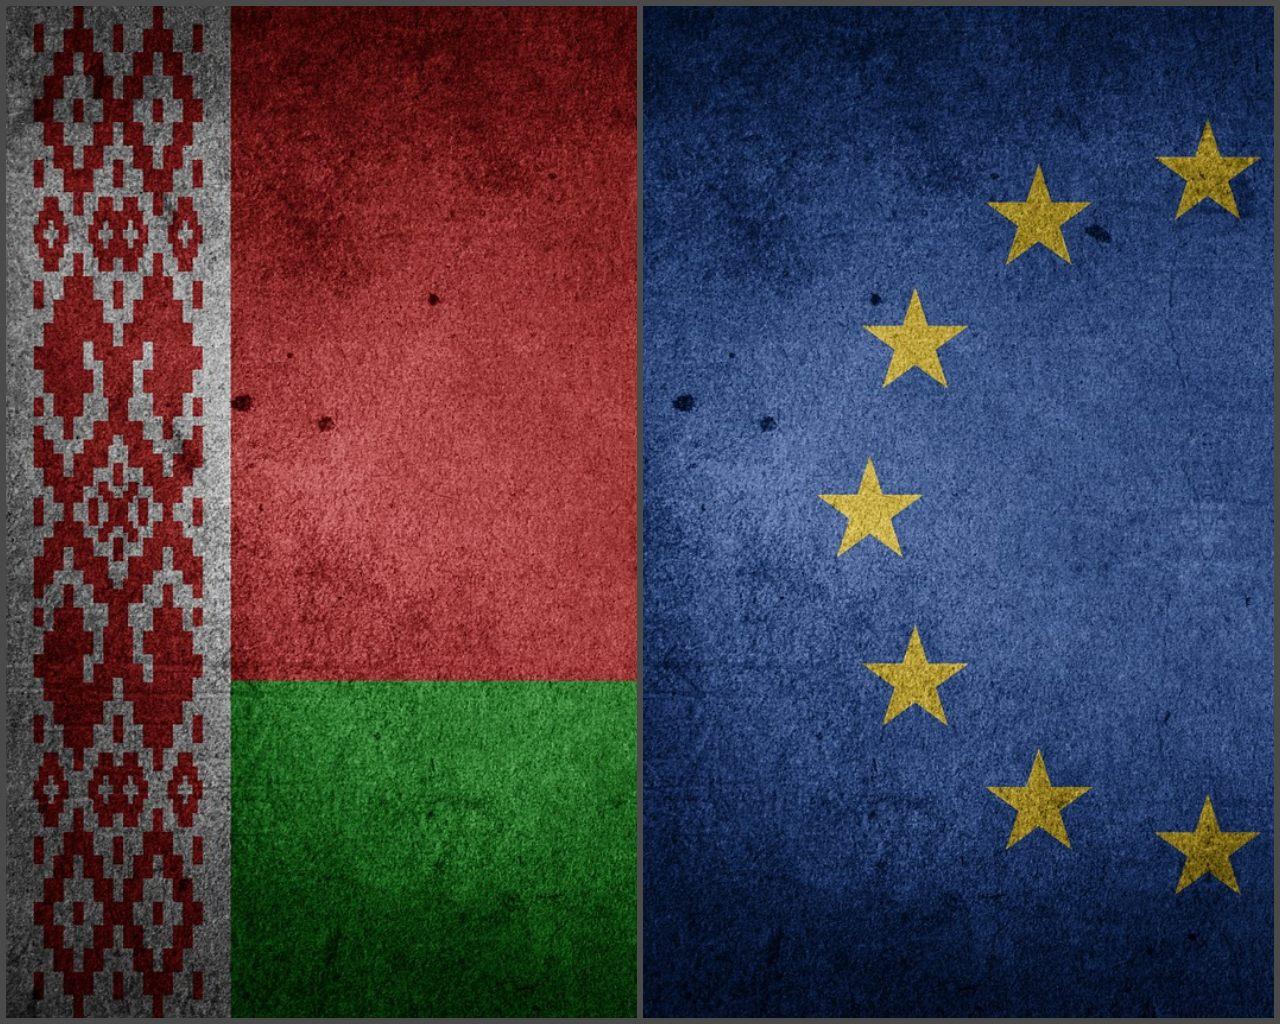 Belarus and Euroepan Union Flag